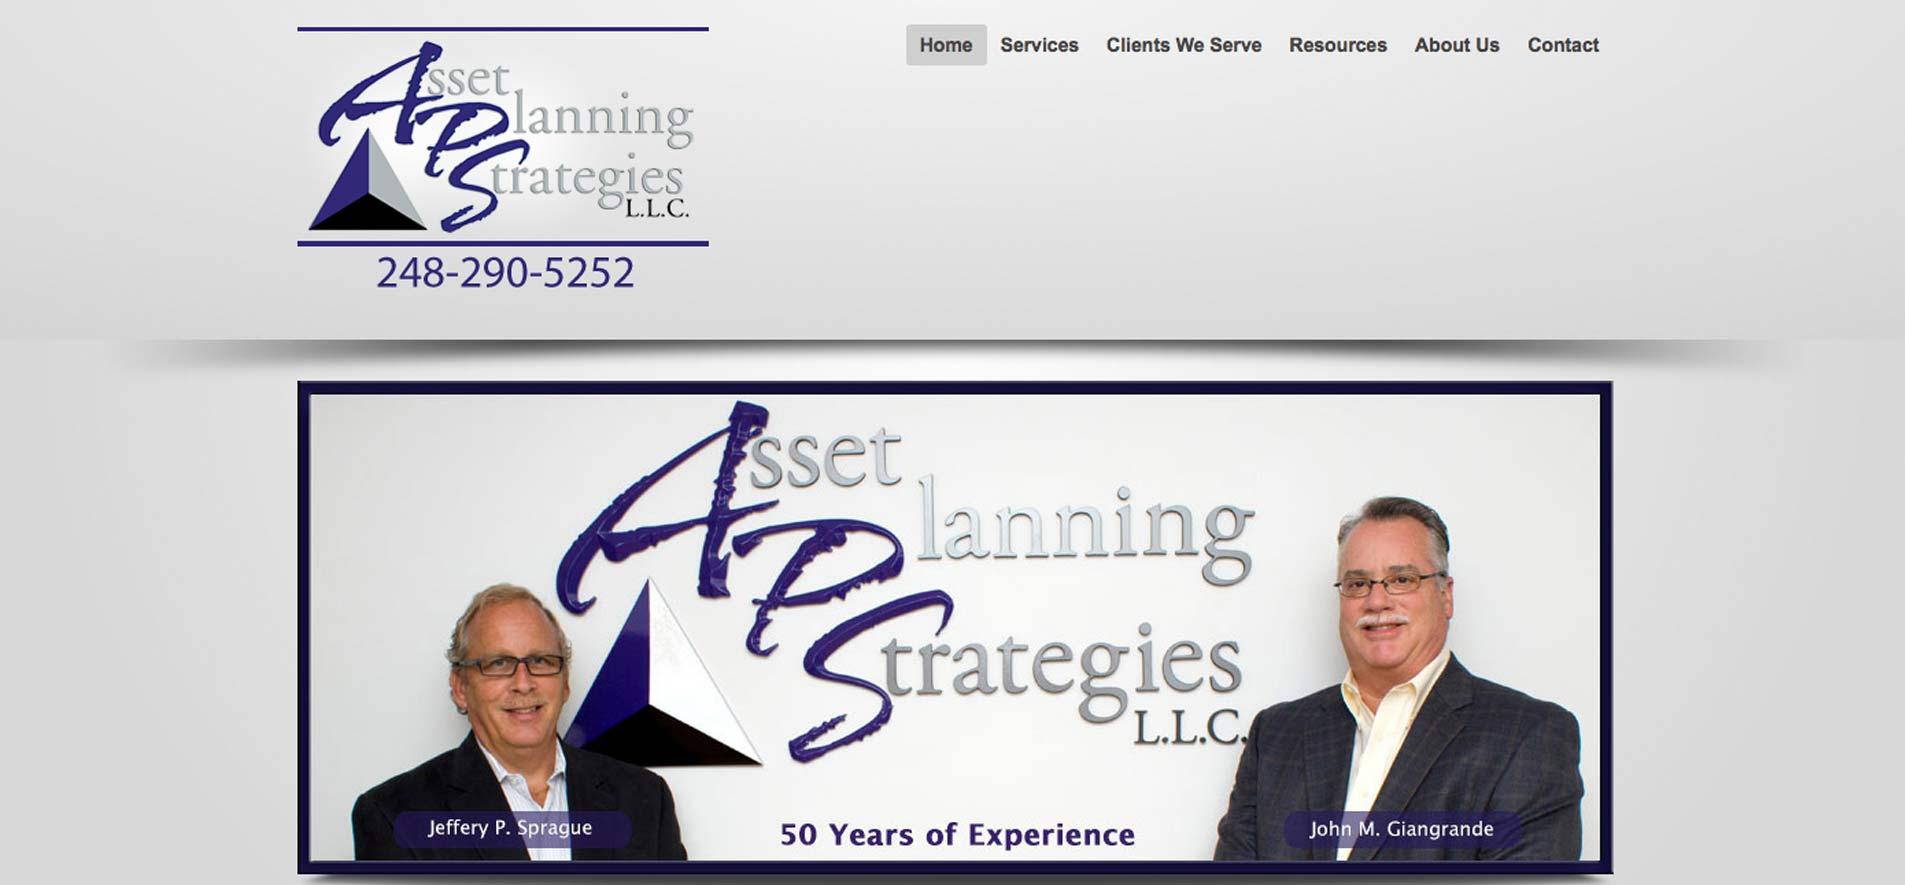 Asset Planning Strategies